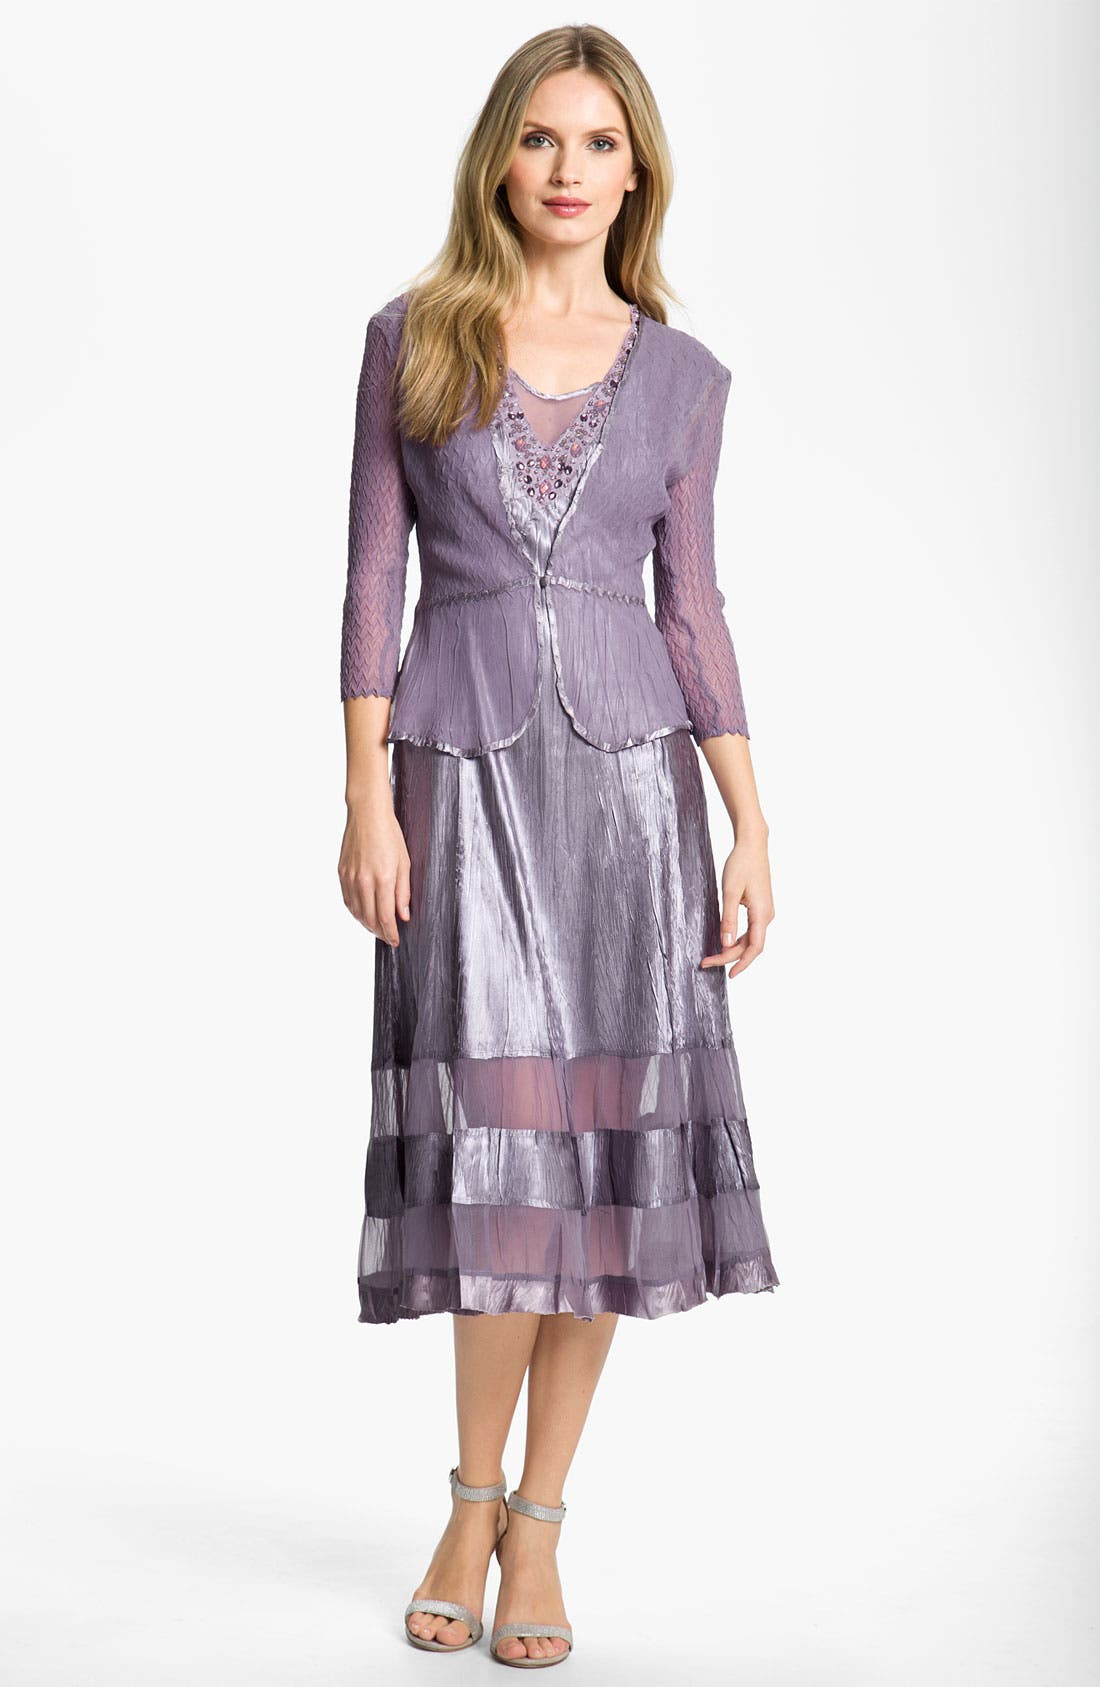 Main Image - Komarov Sheer Panel Charmeuse Dress & Chiffon Jacket